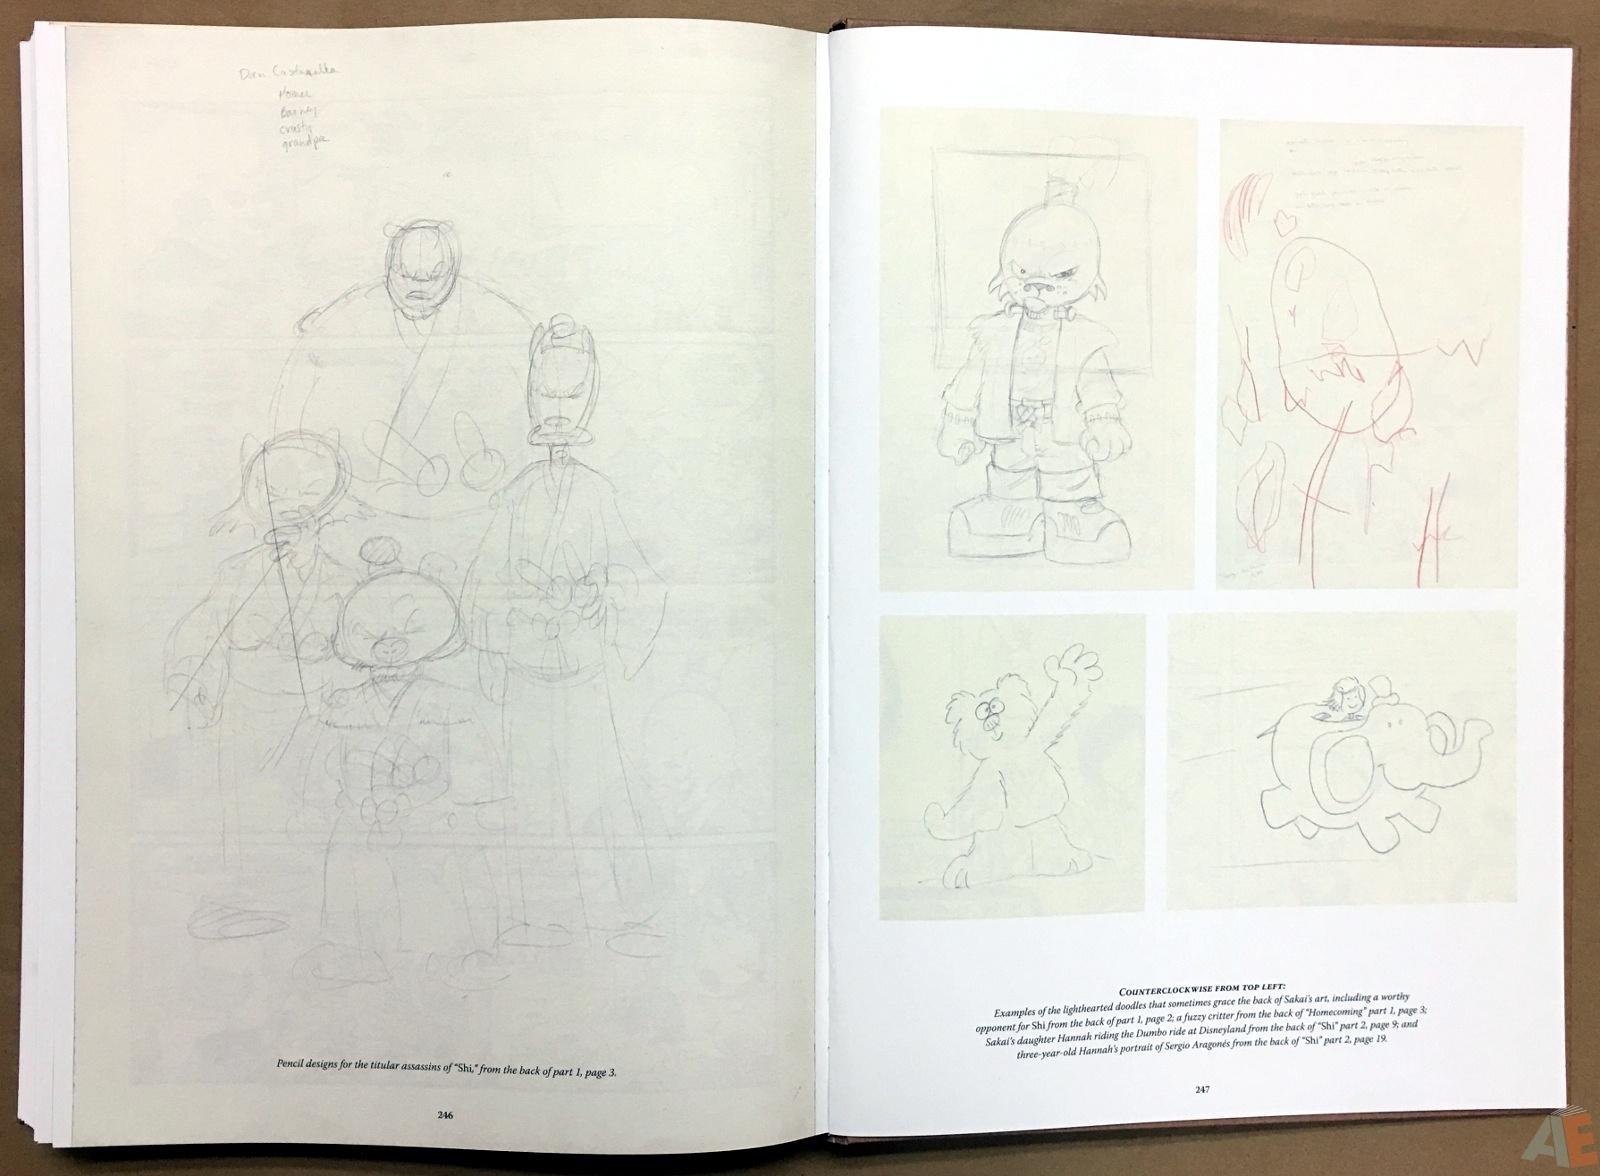 Usagi Yojimbo: Samurai and Other Stories Gallery Edition 46